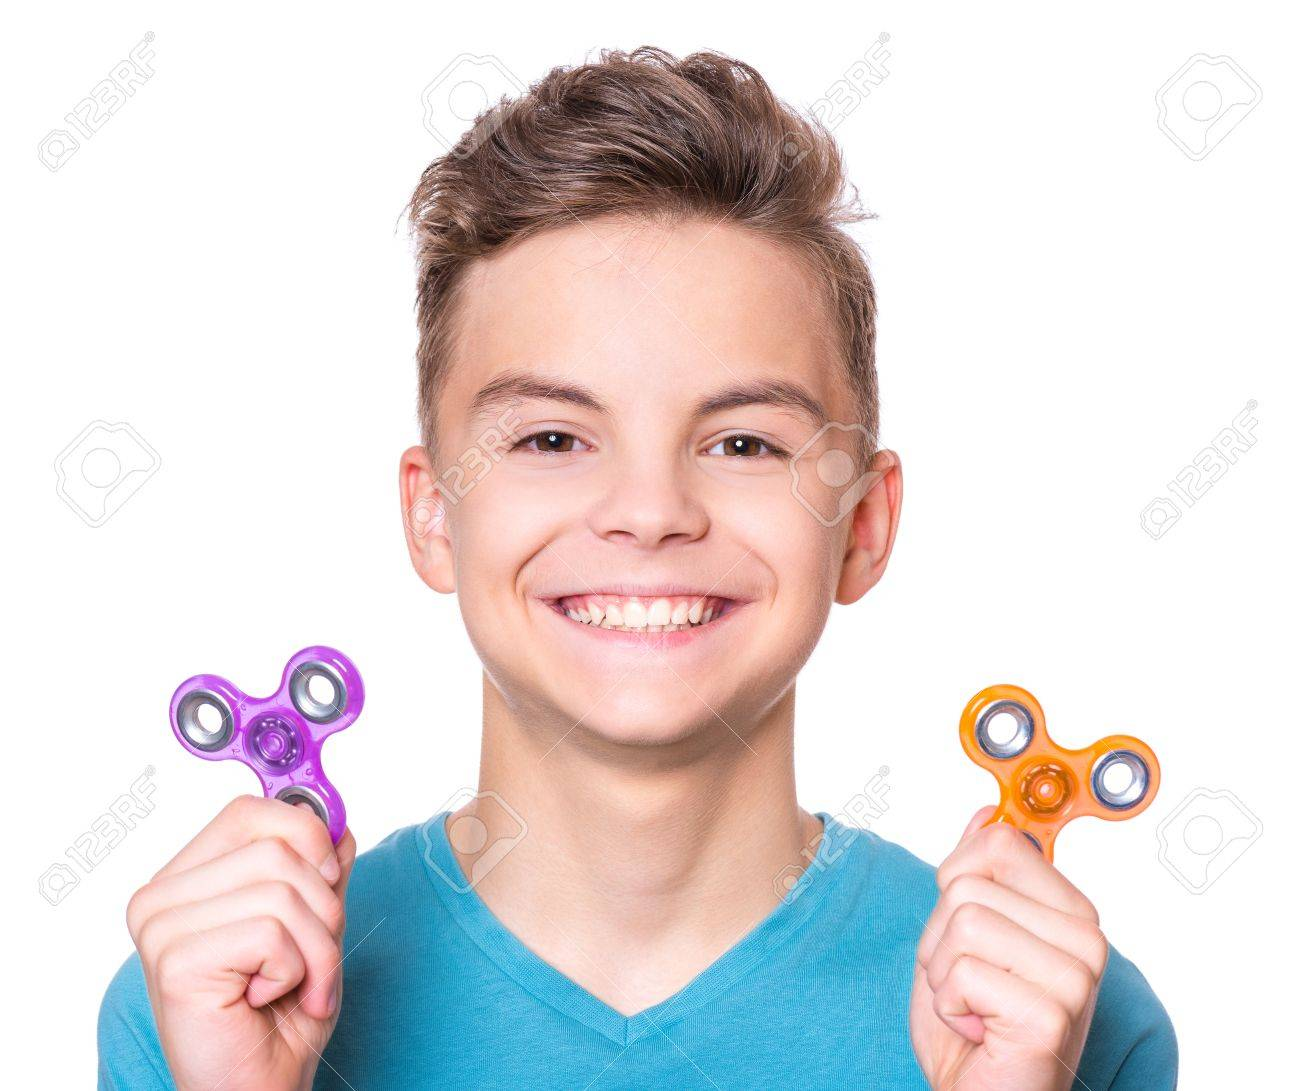 adolescent garçon avec gros pénis